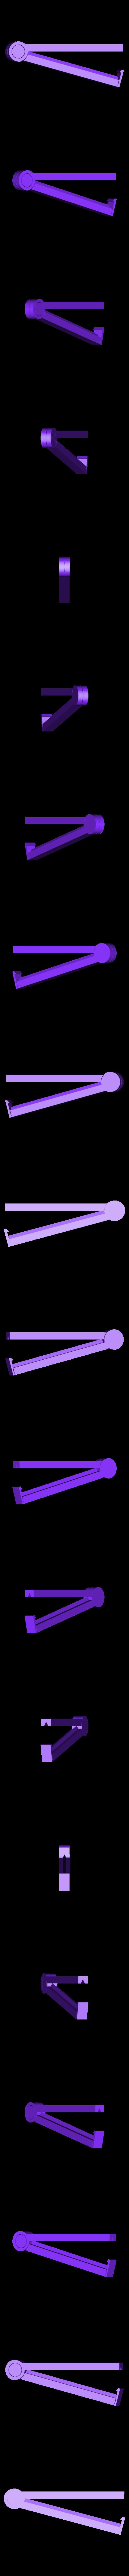 newclip.stl Download free STL file BAG CLIP - New 2019 Design • 3D printing design, atornago